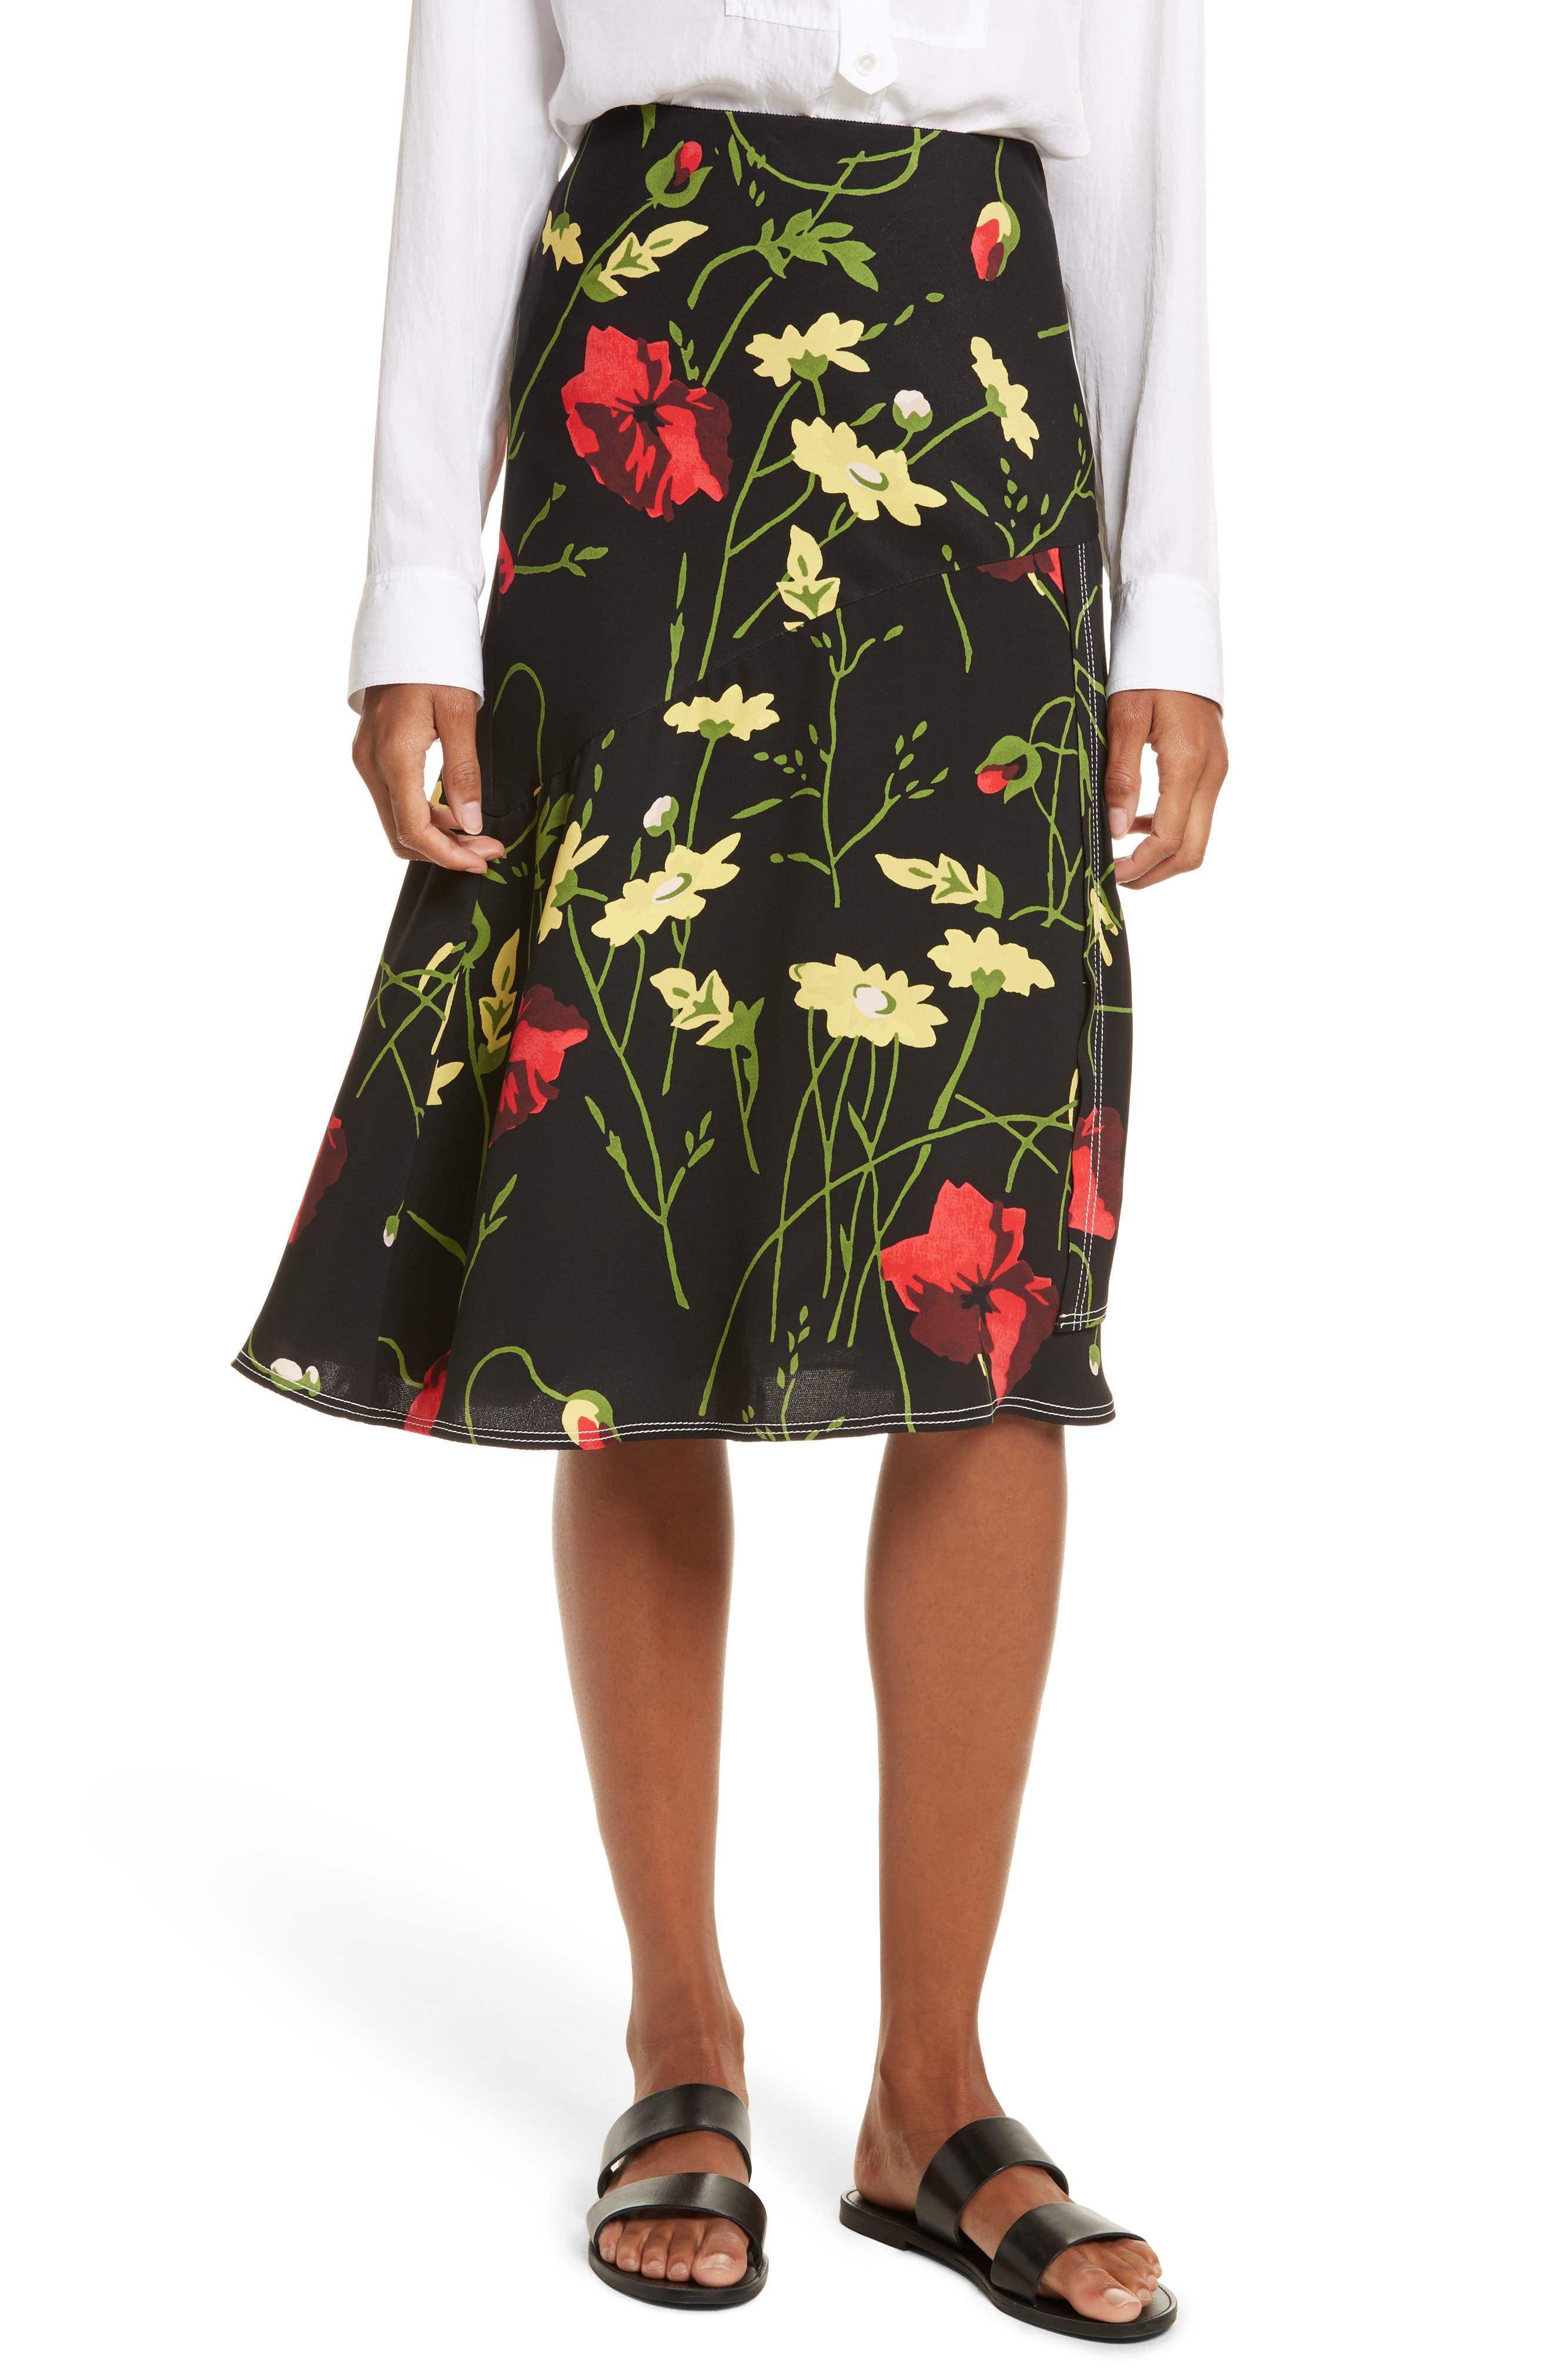 GREY Jason Wu Floral Print Silk Skirt